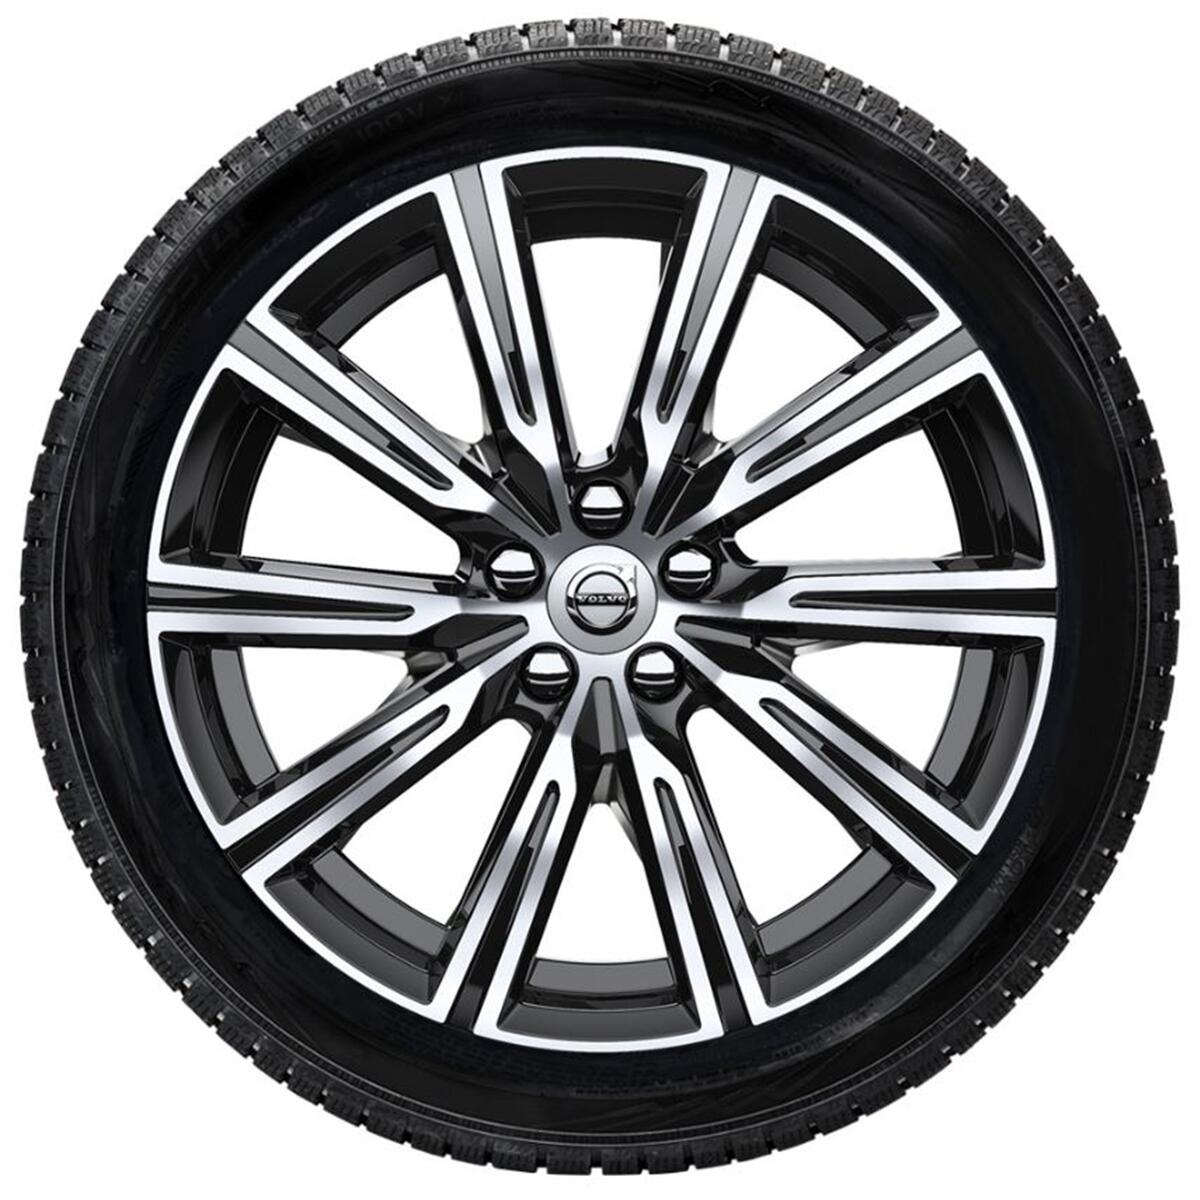 komplet zimskih točkova: 19'', gume Pirelli